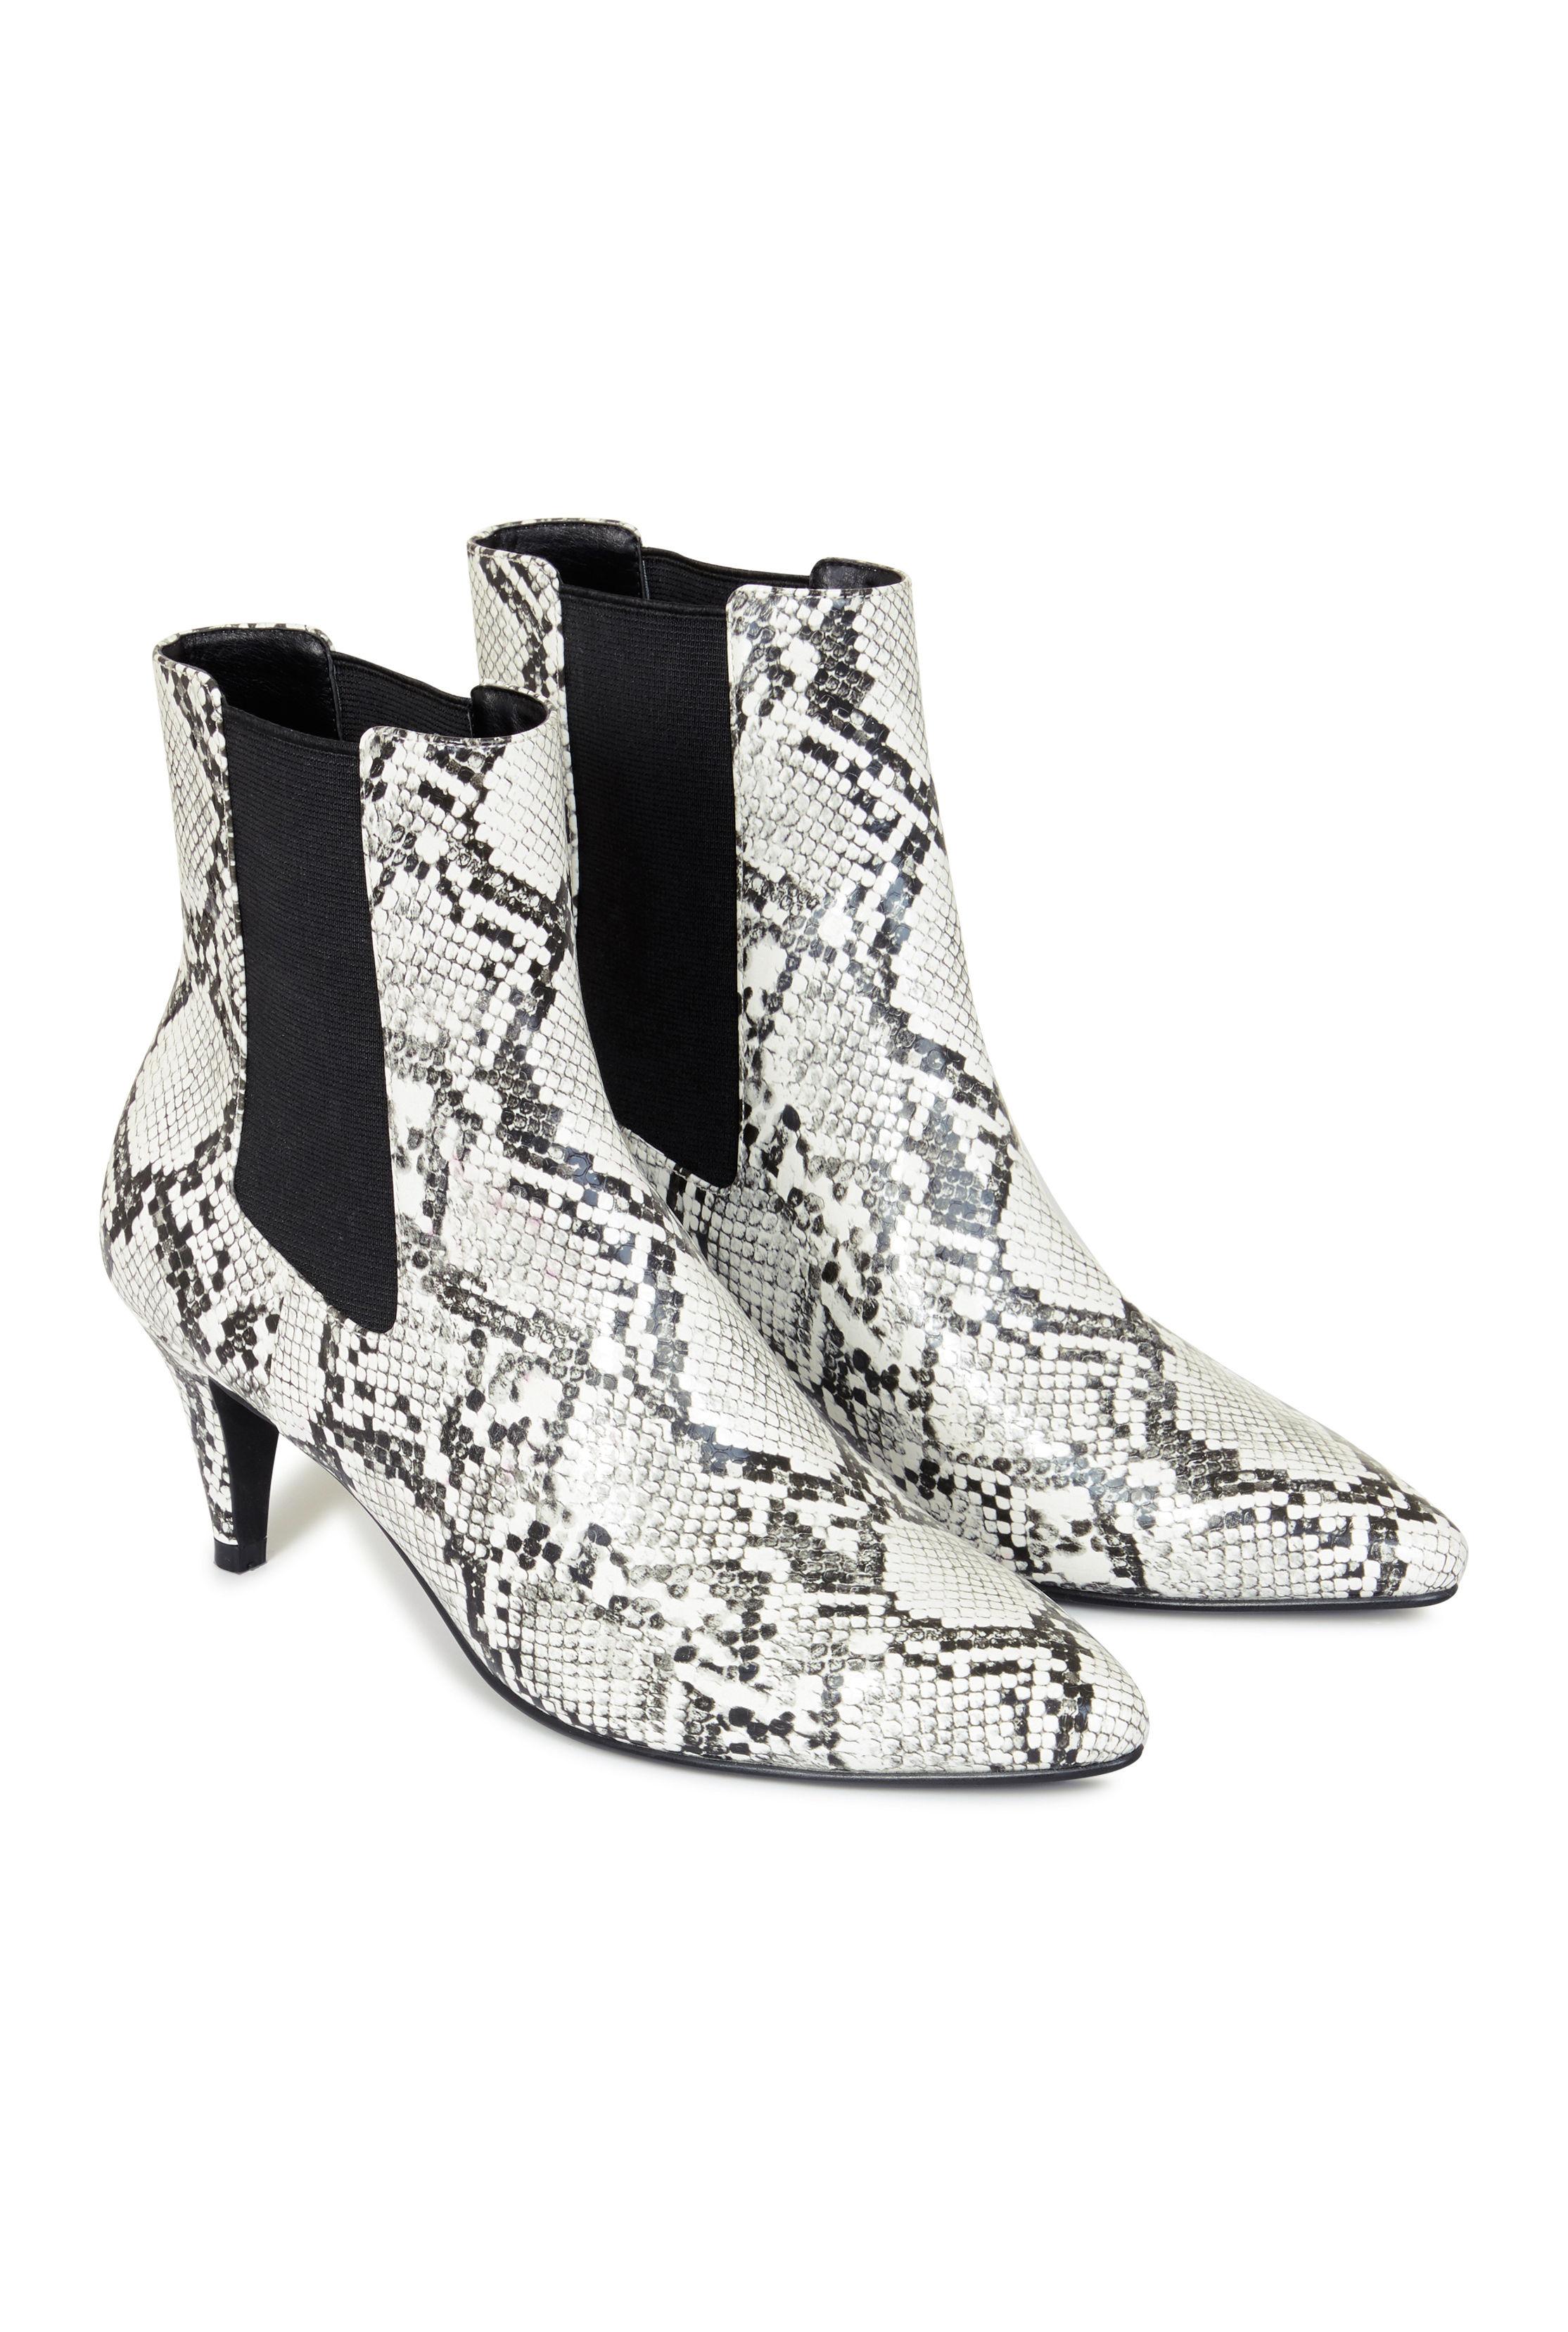 LTS Josie Kitten Heel Ankle Boot